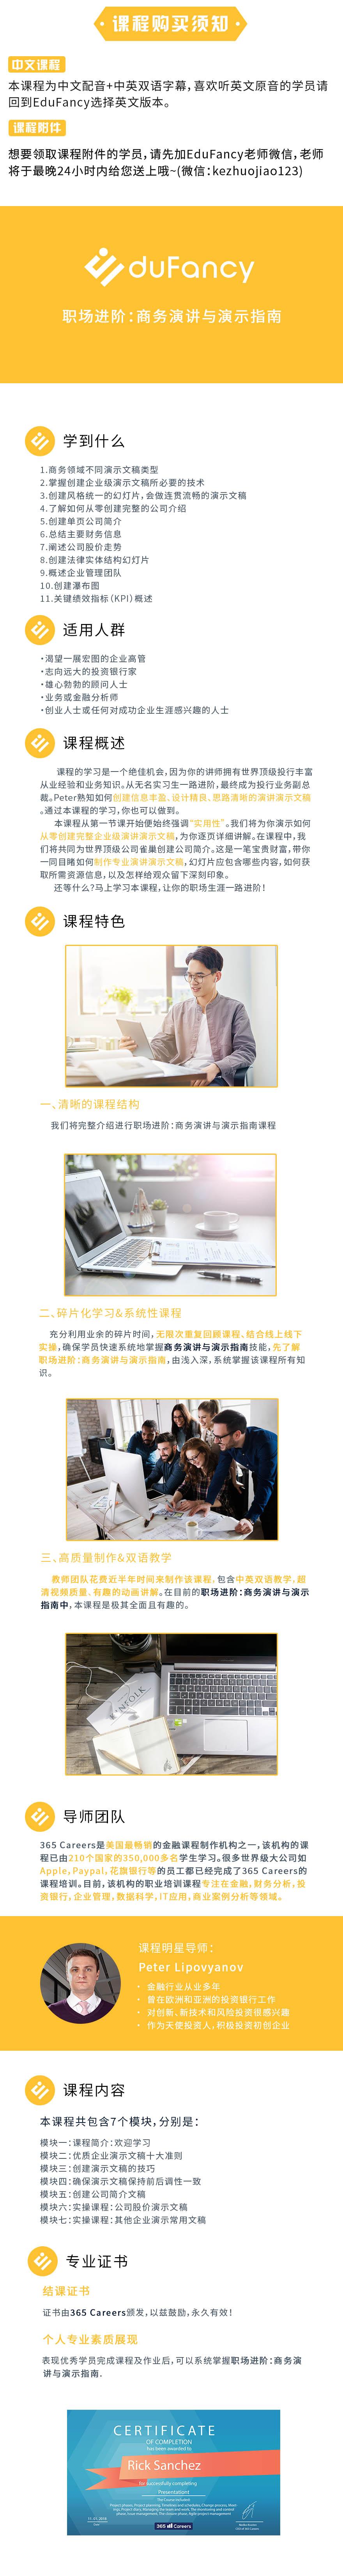 presentation(中).jpg